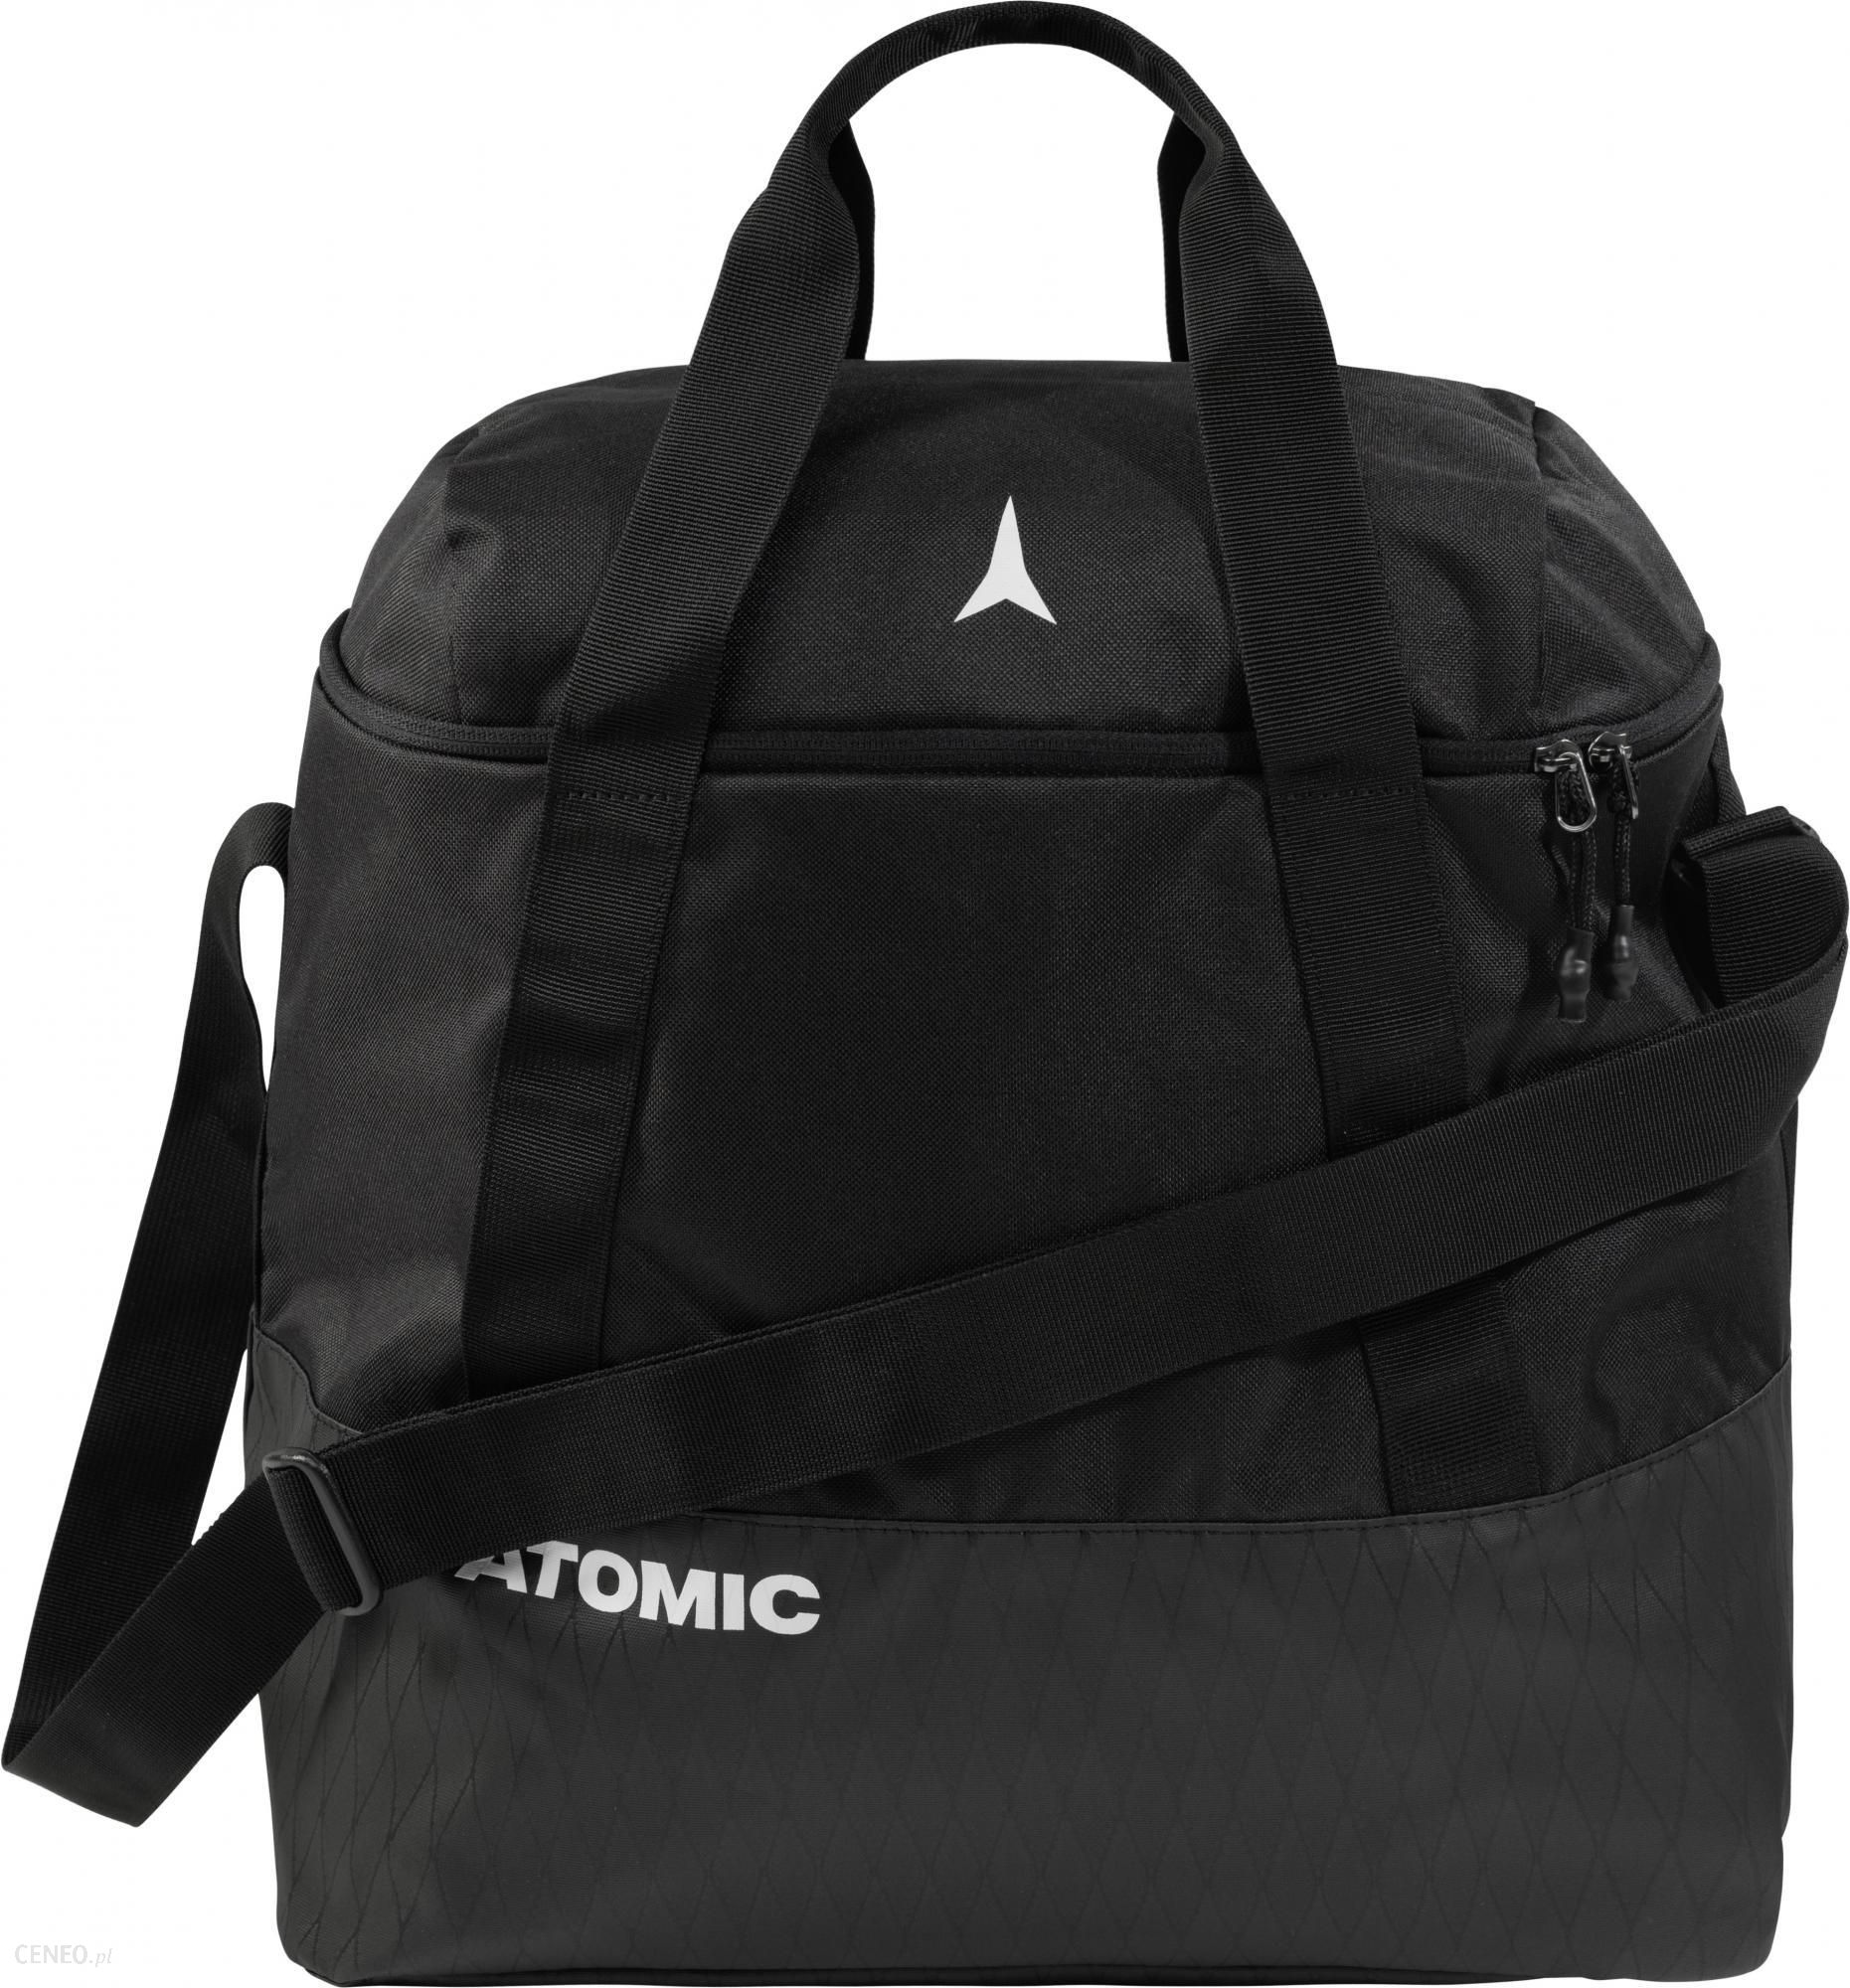 Atomic Torba Na Buty Narciarskie Boot Bag Black Black Ceny i opinie Ceneo.pl